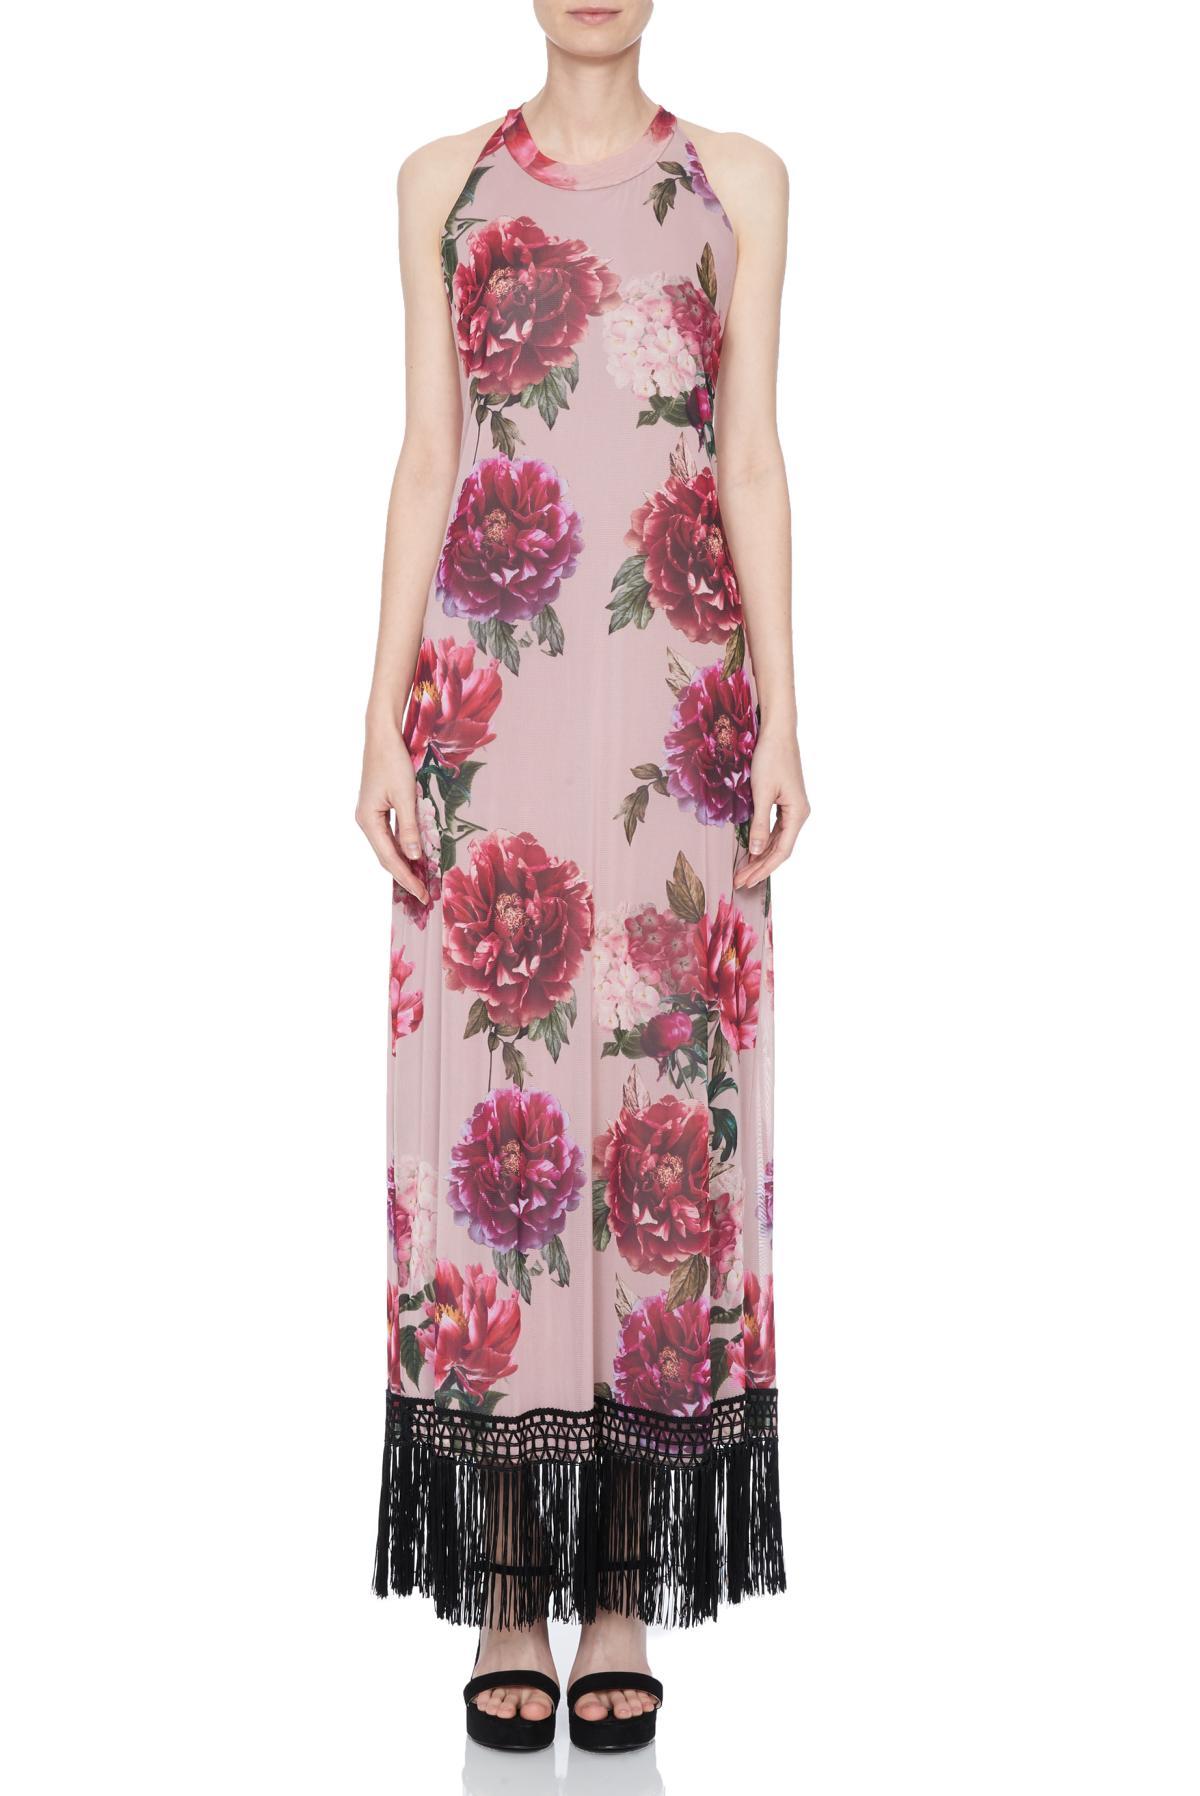 Front of Ana Alcazar Maxi Dress Nivanna  worn by model